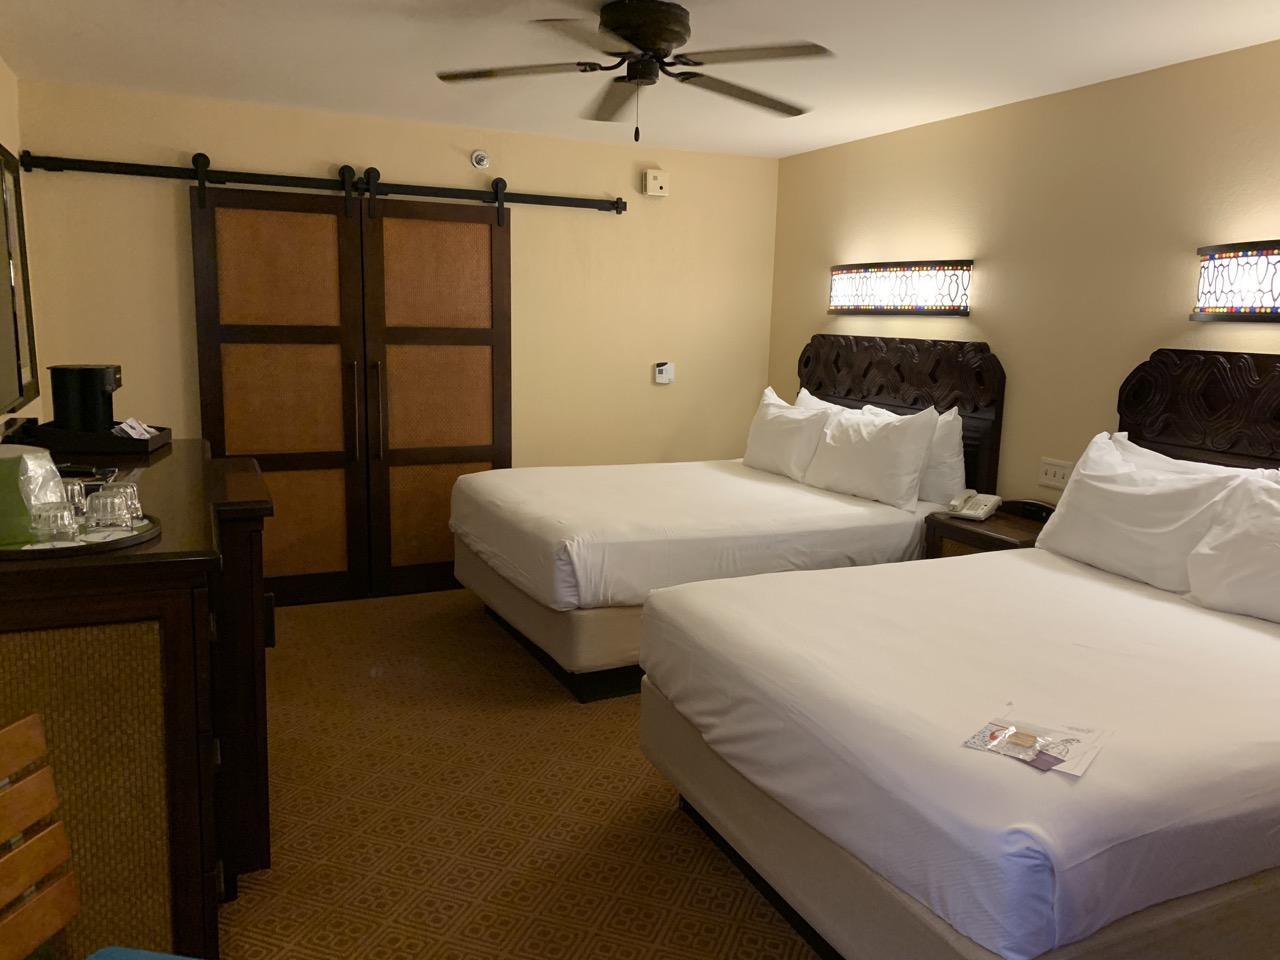 disney world best moderate resorts rankings 01 caribbean room.jpeg